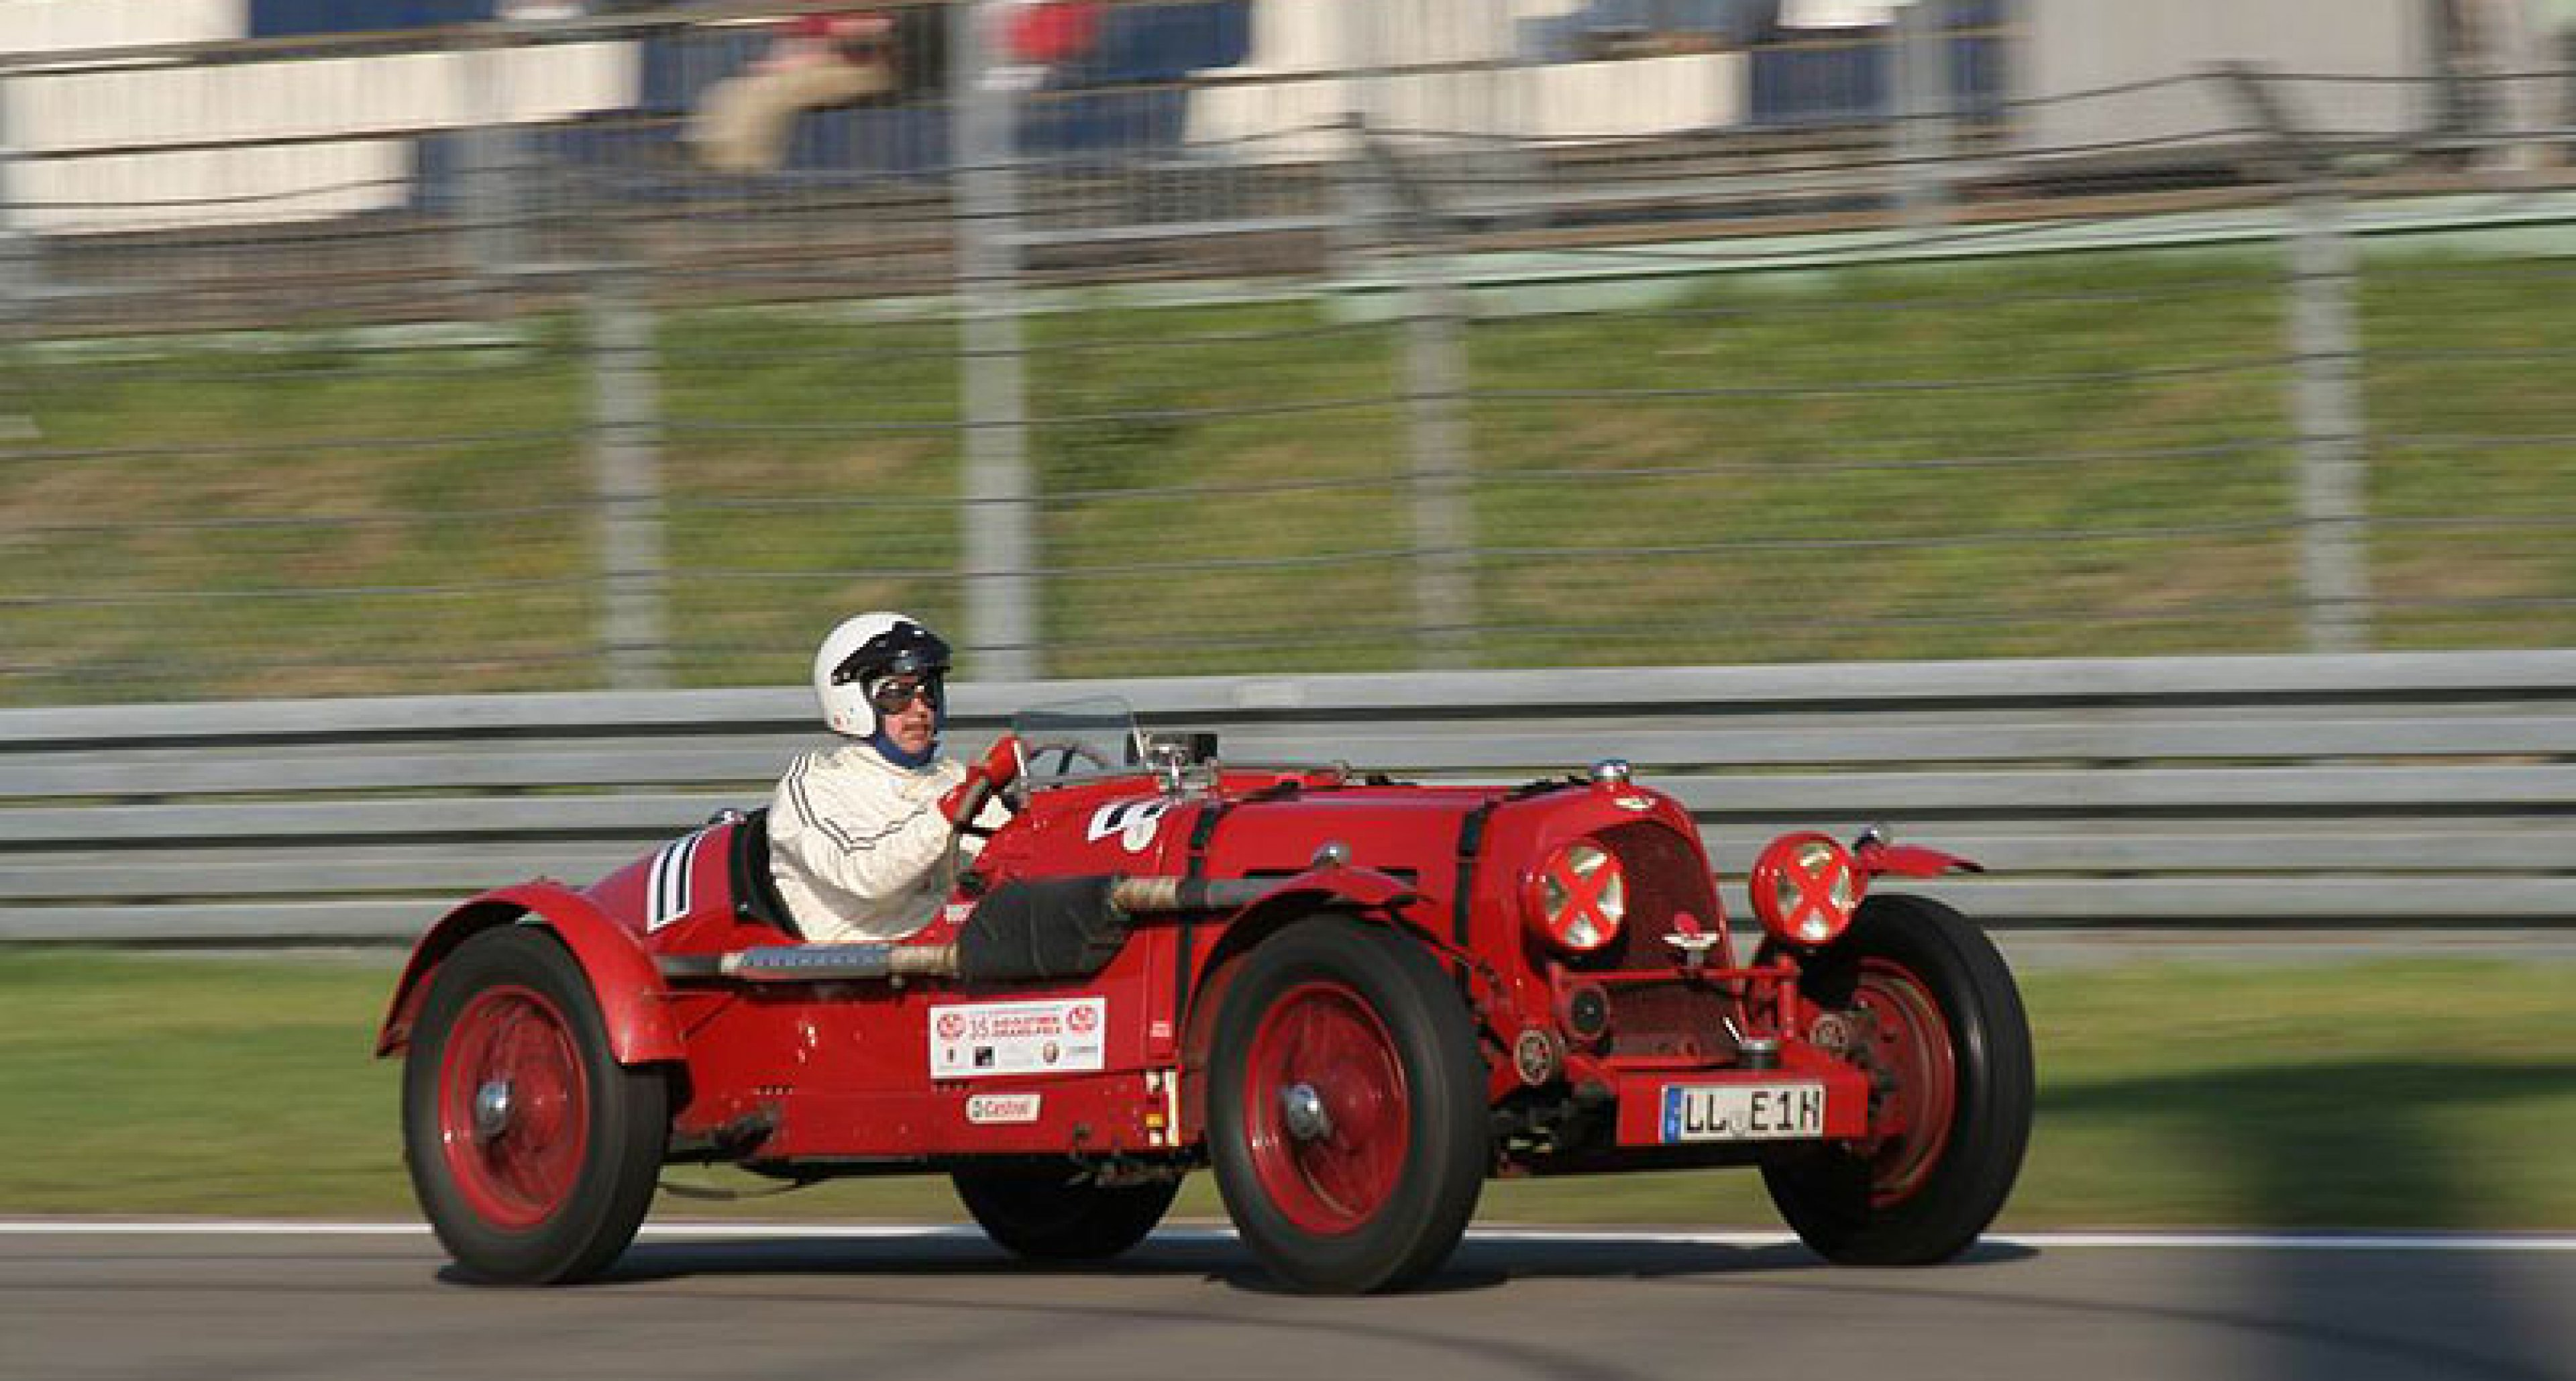 Team Classic Driver beim Oldtimer-Grand-Prix 2009